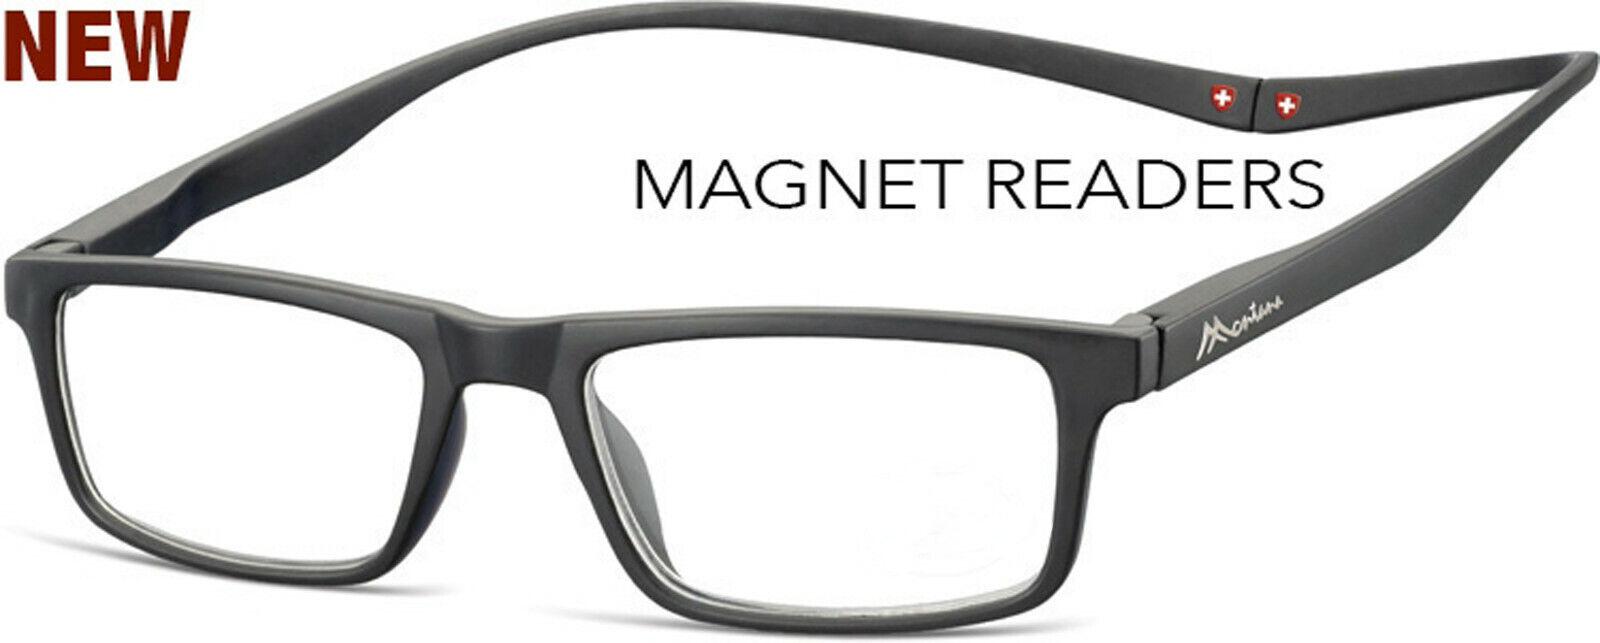 Lesebrille mit Magnet Lesehilfe in schwarz magnet reader 1,0 bis 3,5 Neu